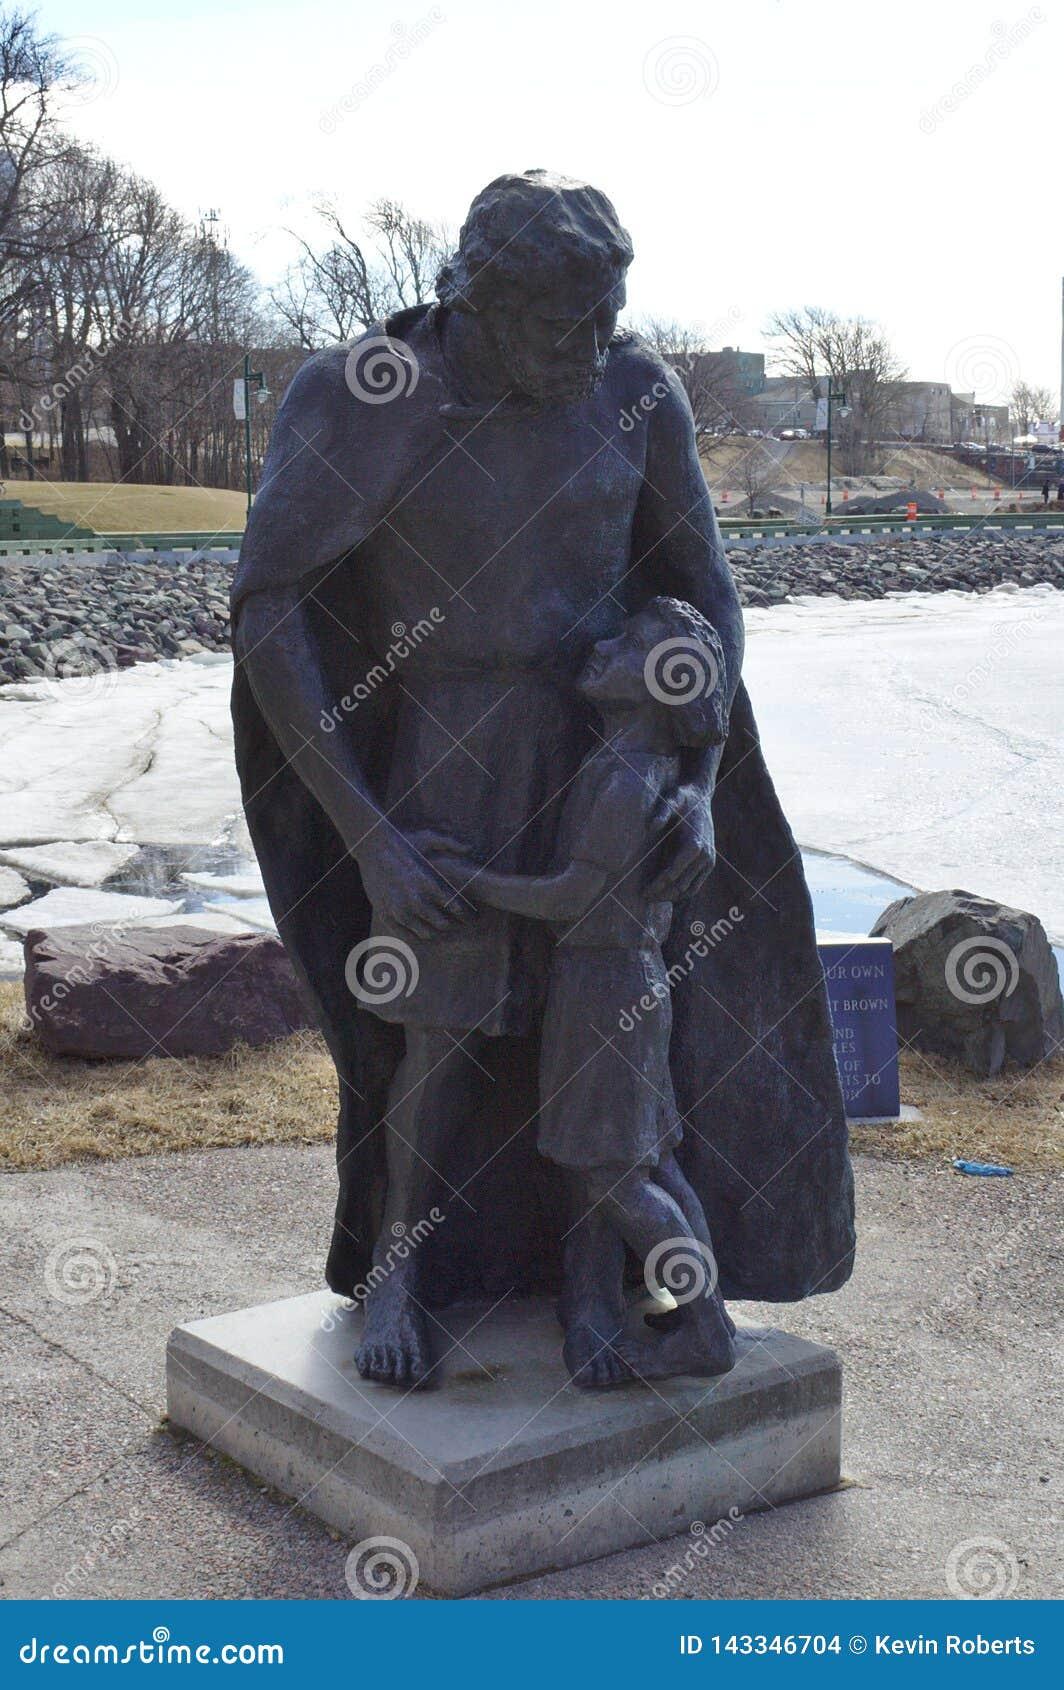 Statue of man & girl